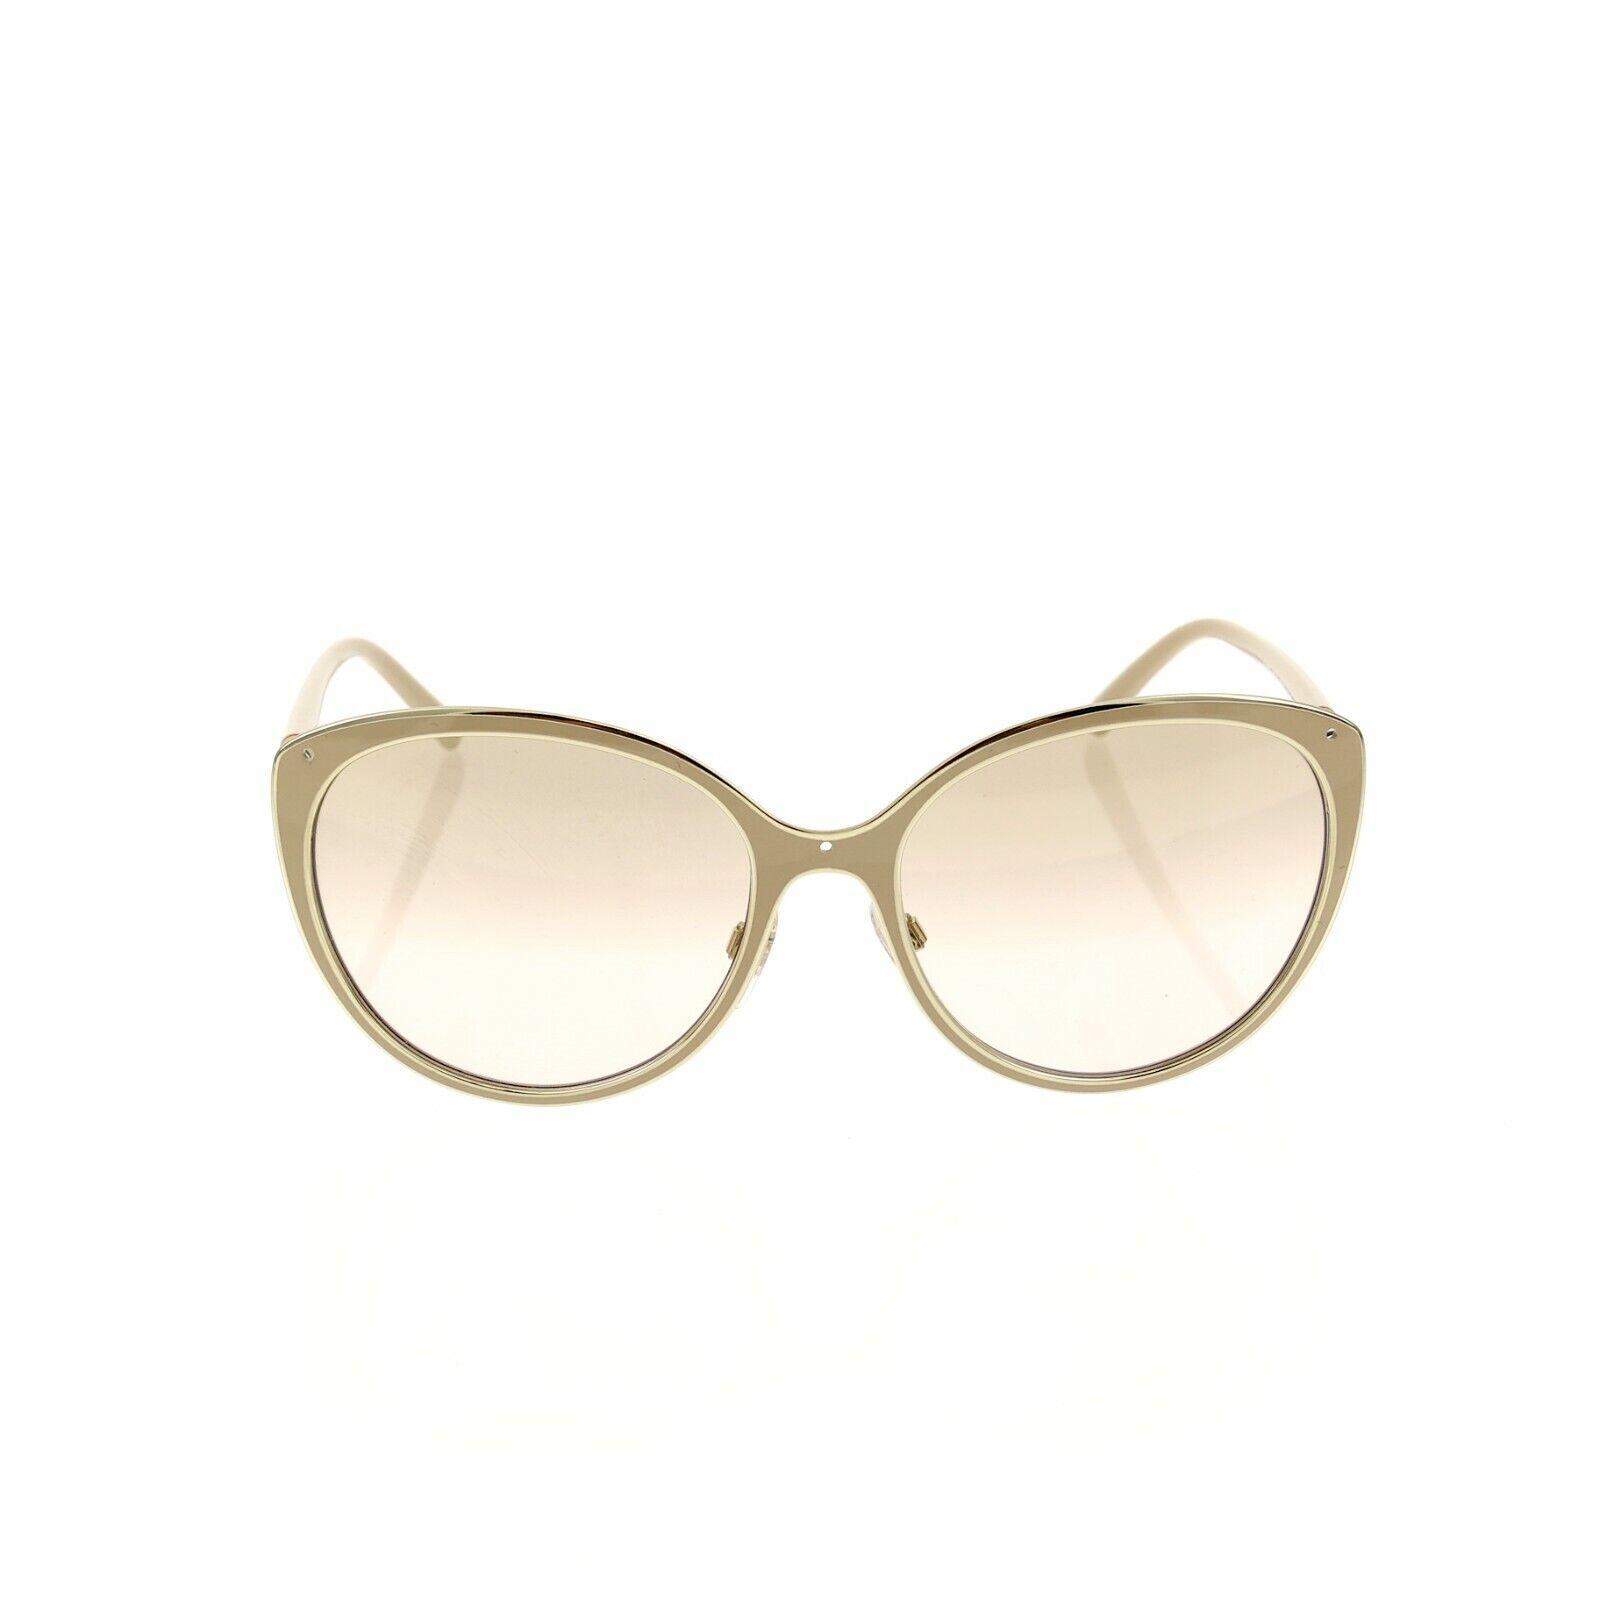 Burberry 3096 Woman's Cat Eye 55mm Sunglasses S3040